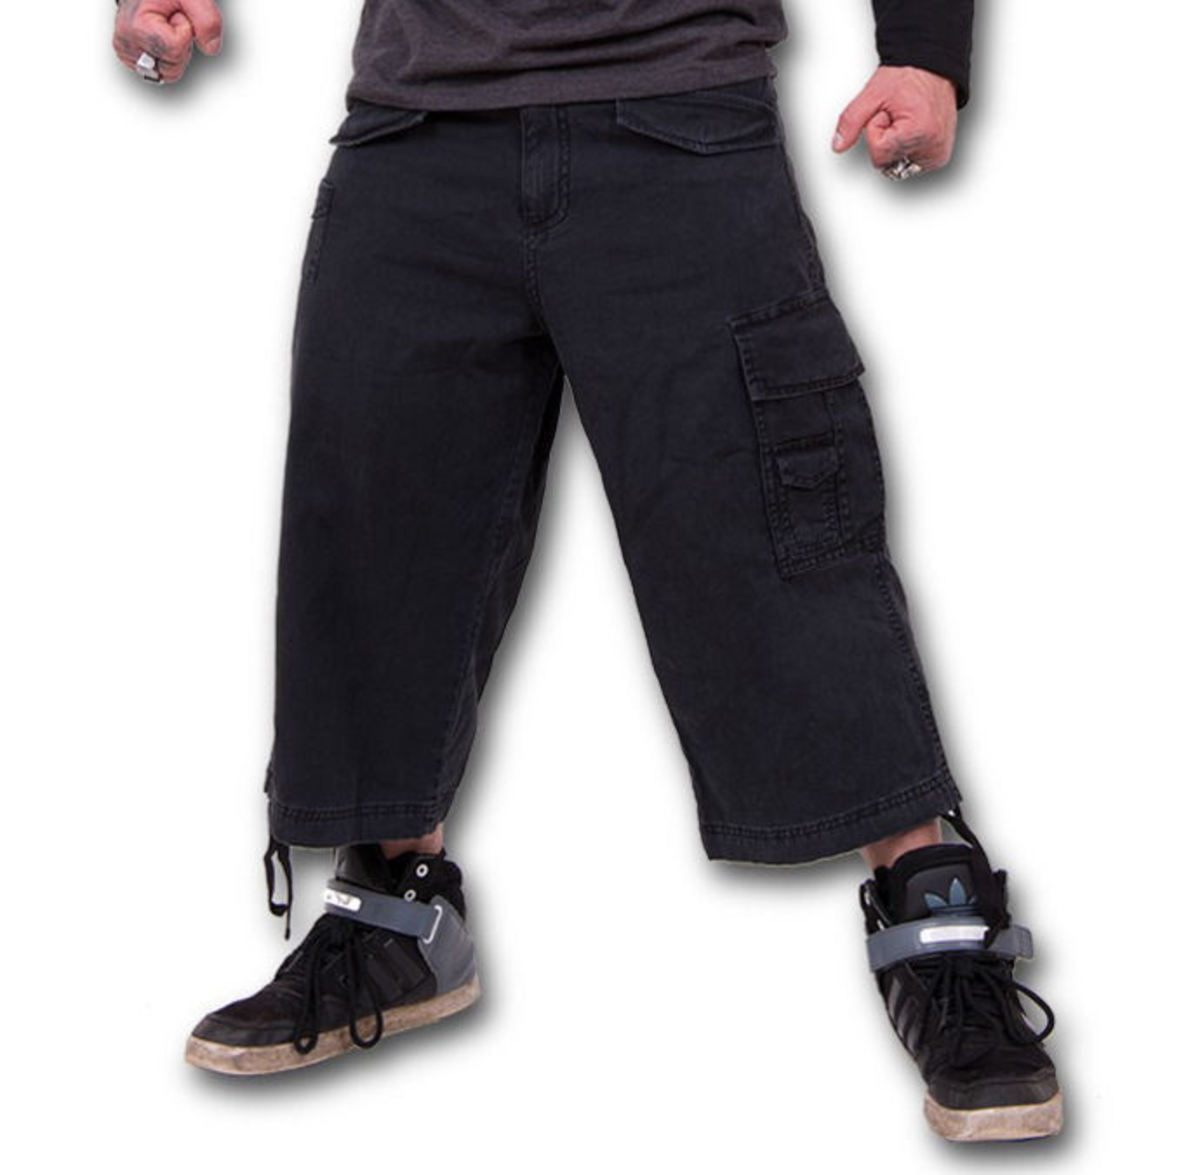 kraťasy 3/4 pánské SPIRAL - Metal Streetwear - P003M705